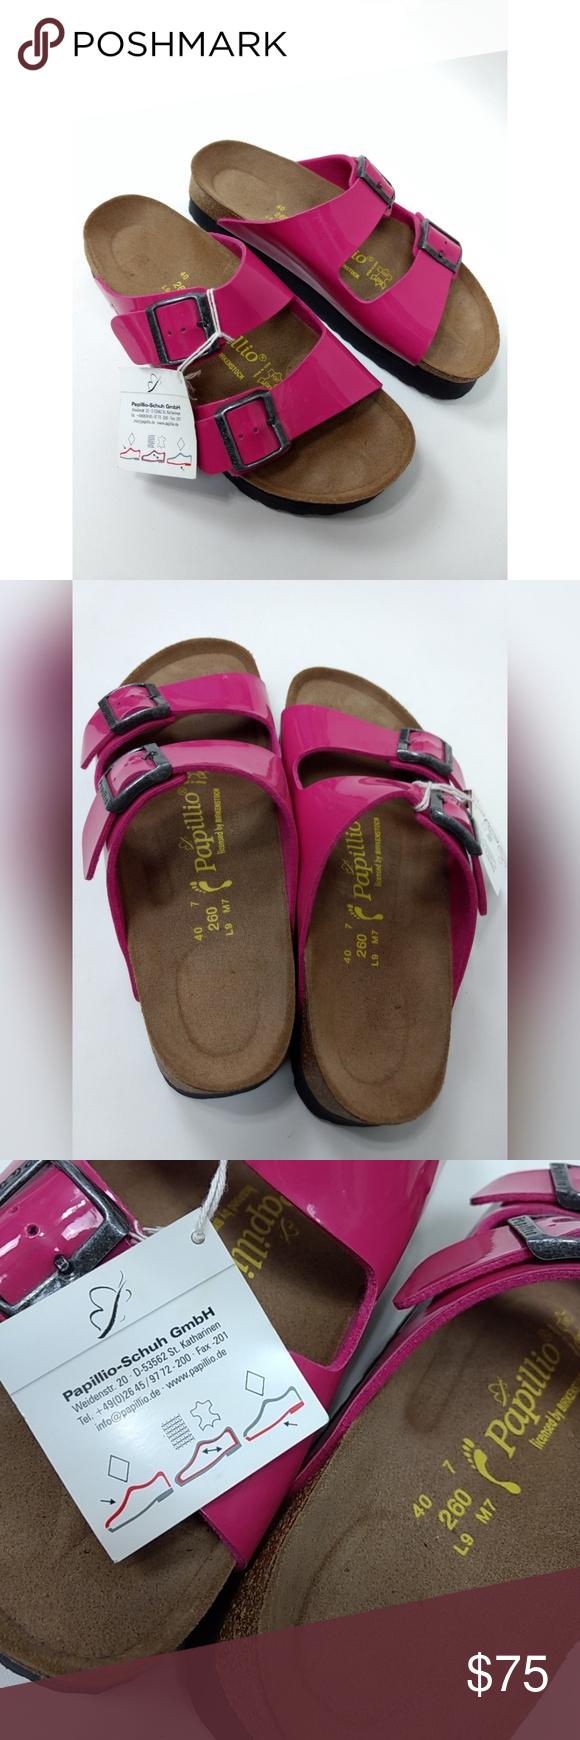 8d7330535d5 Birkenstock Papillio Arizona Platform Sandals 40 9 Brand New with tags